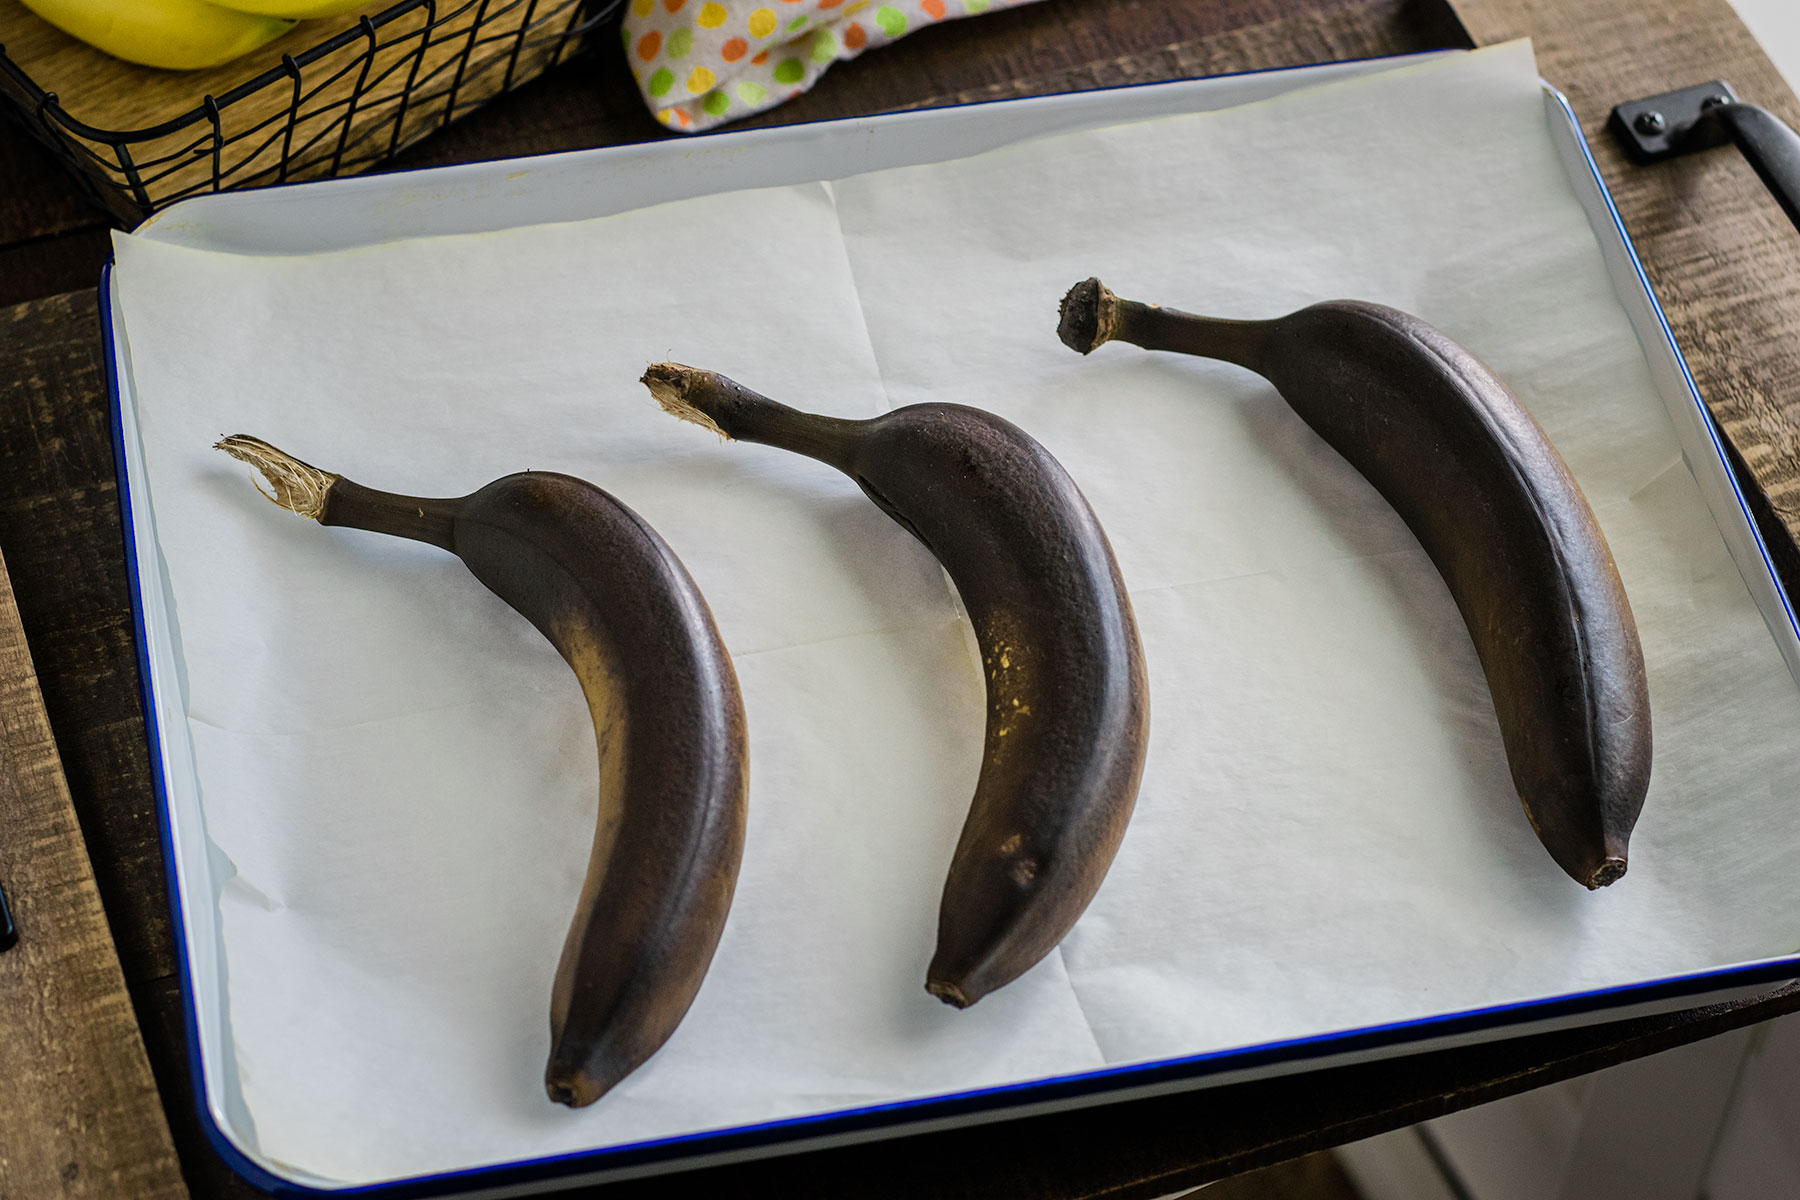 oven ripened bananas on a sheet pan